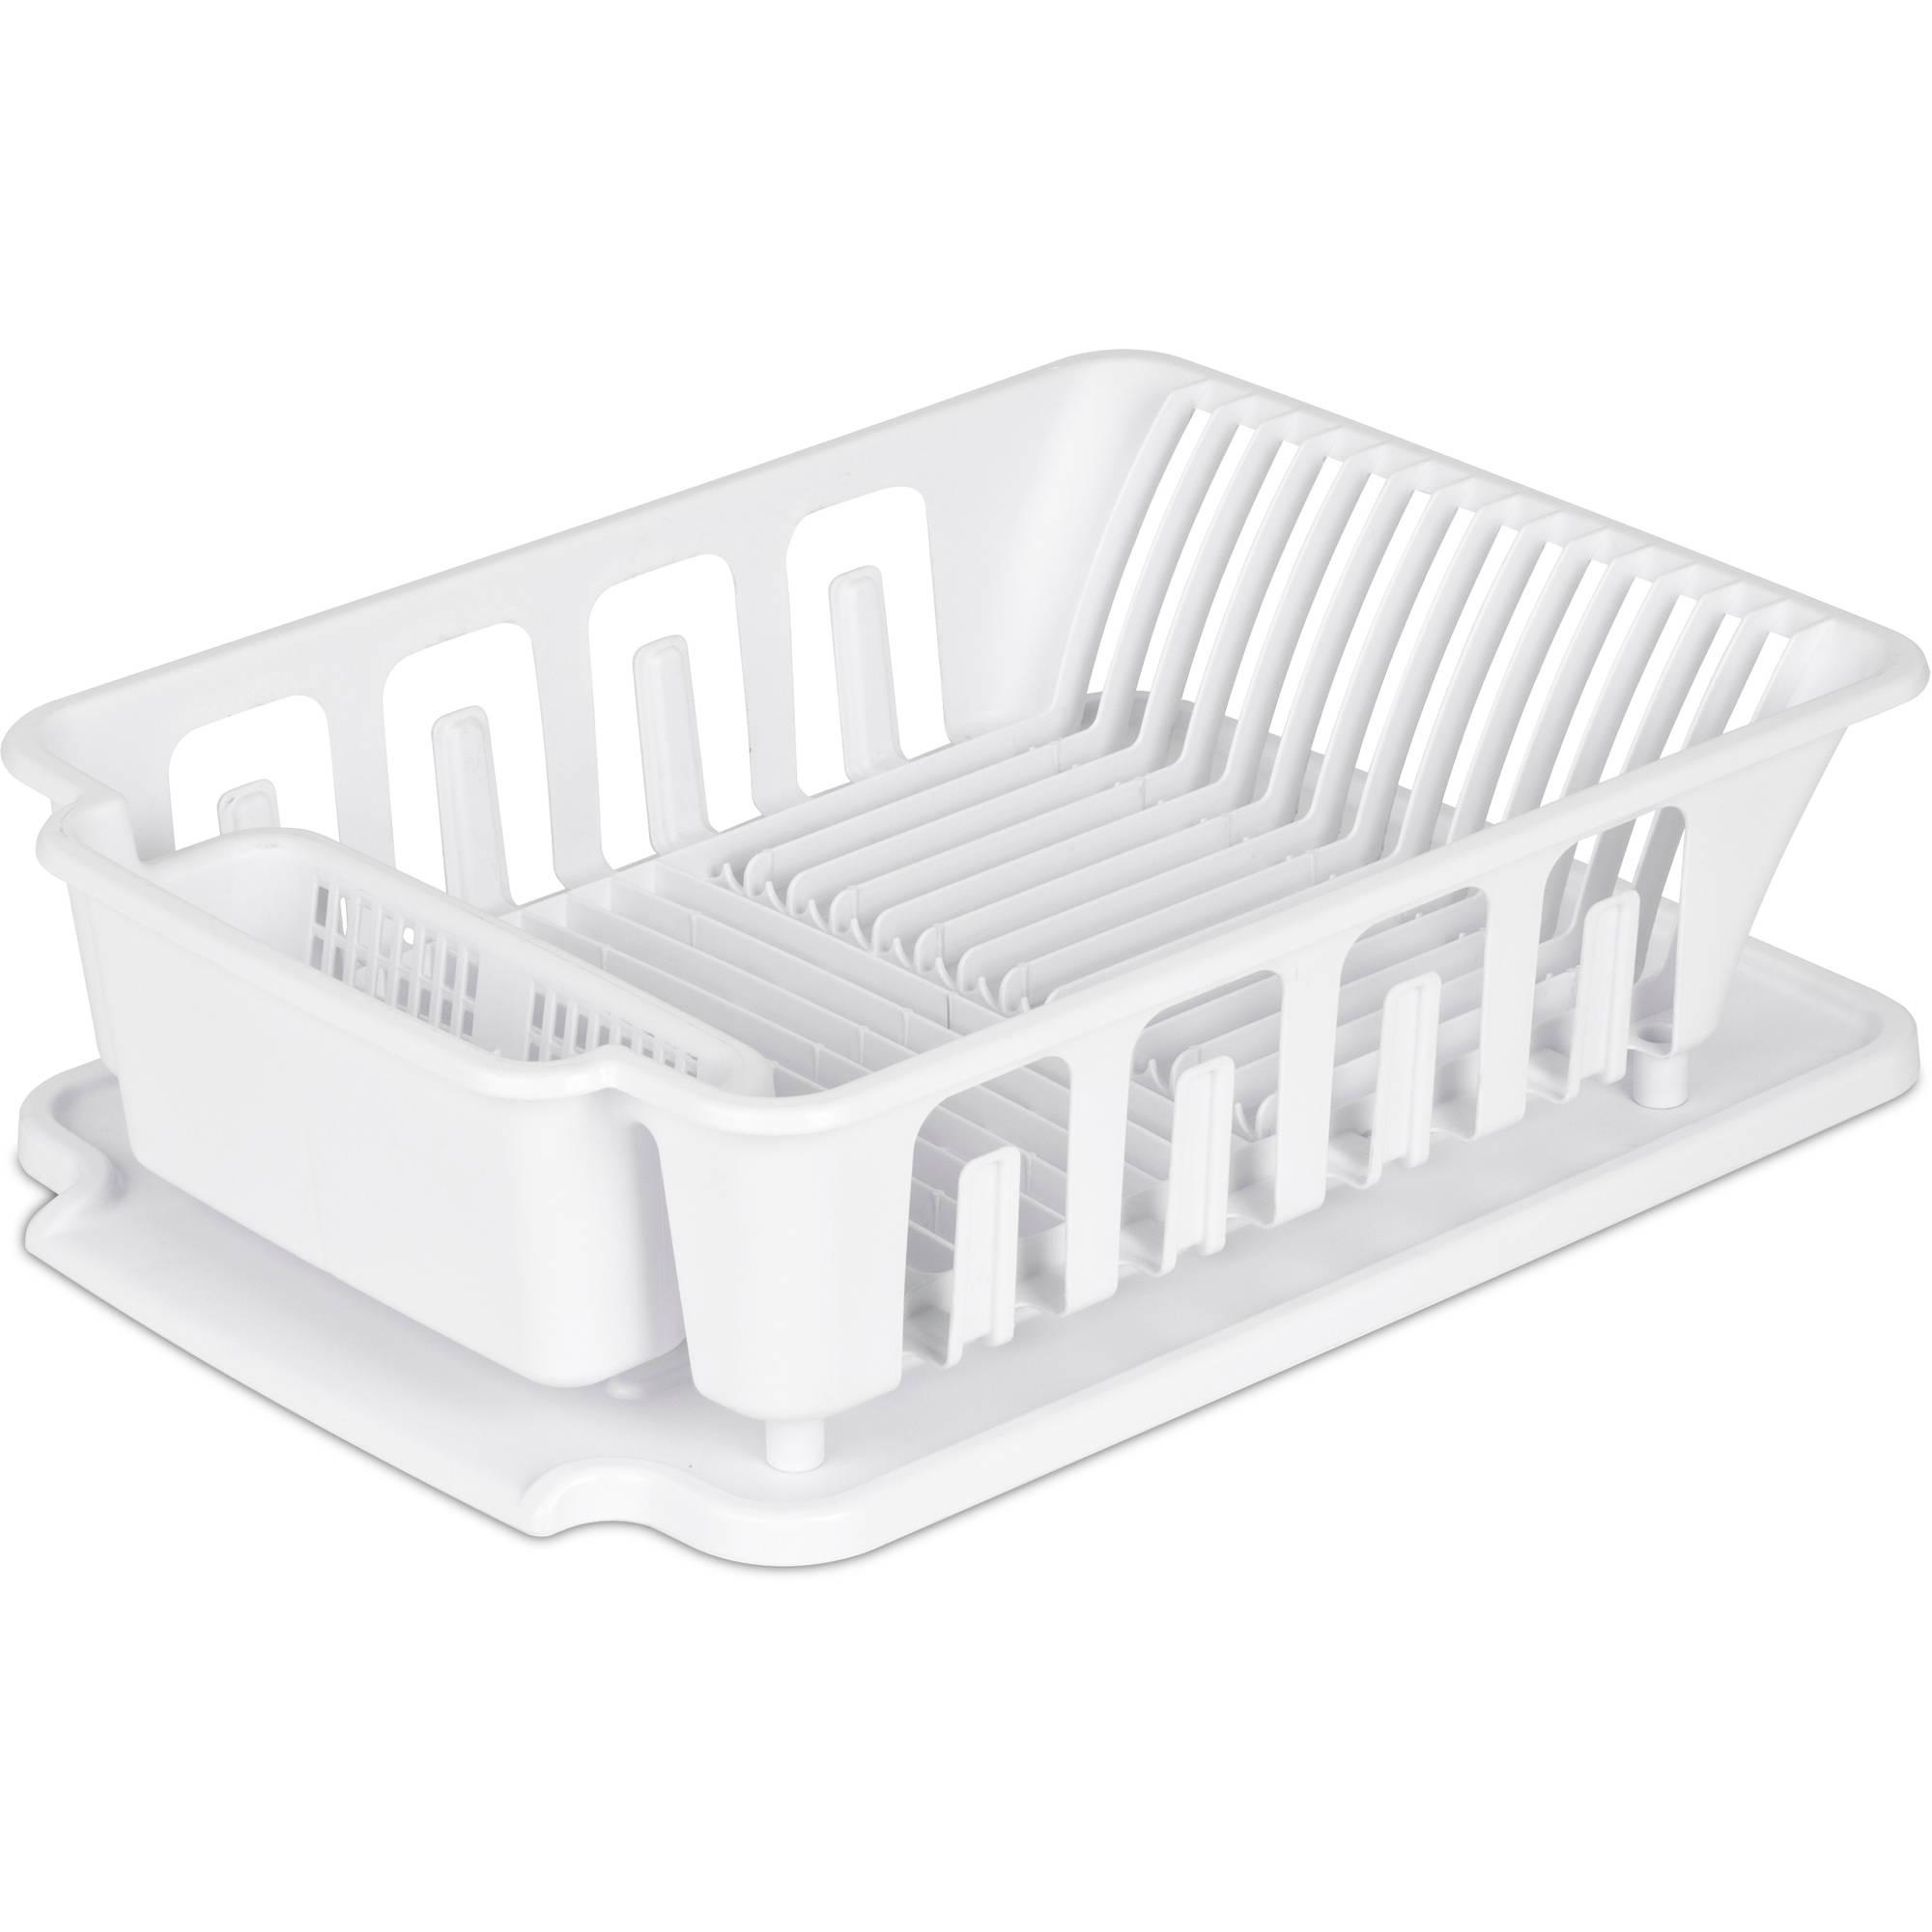 Sterilite 2pc Large Sink Set, White